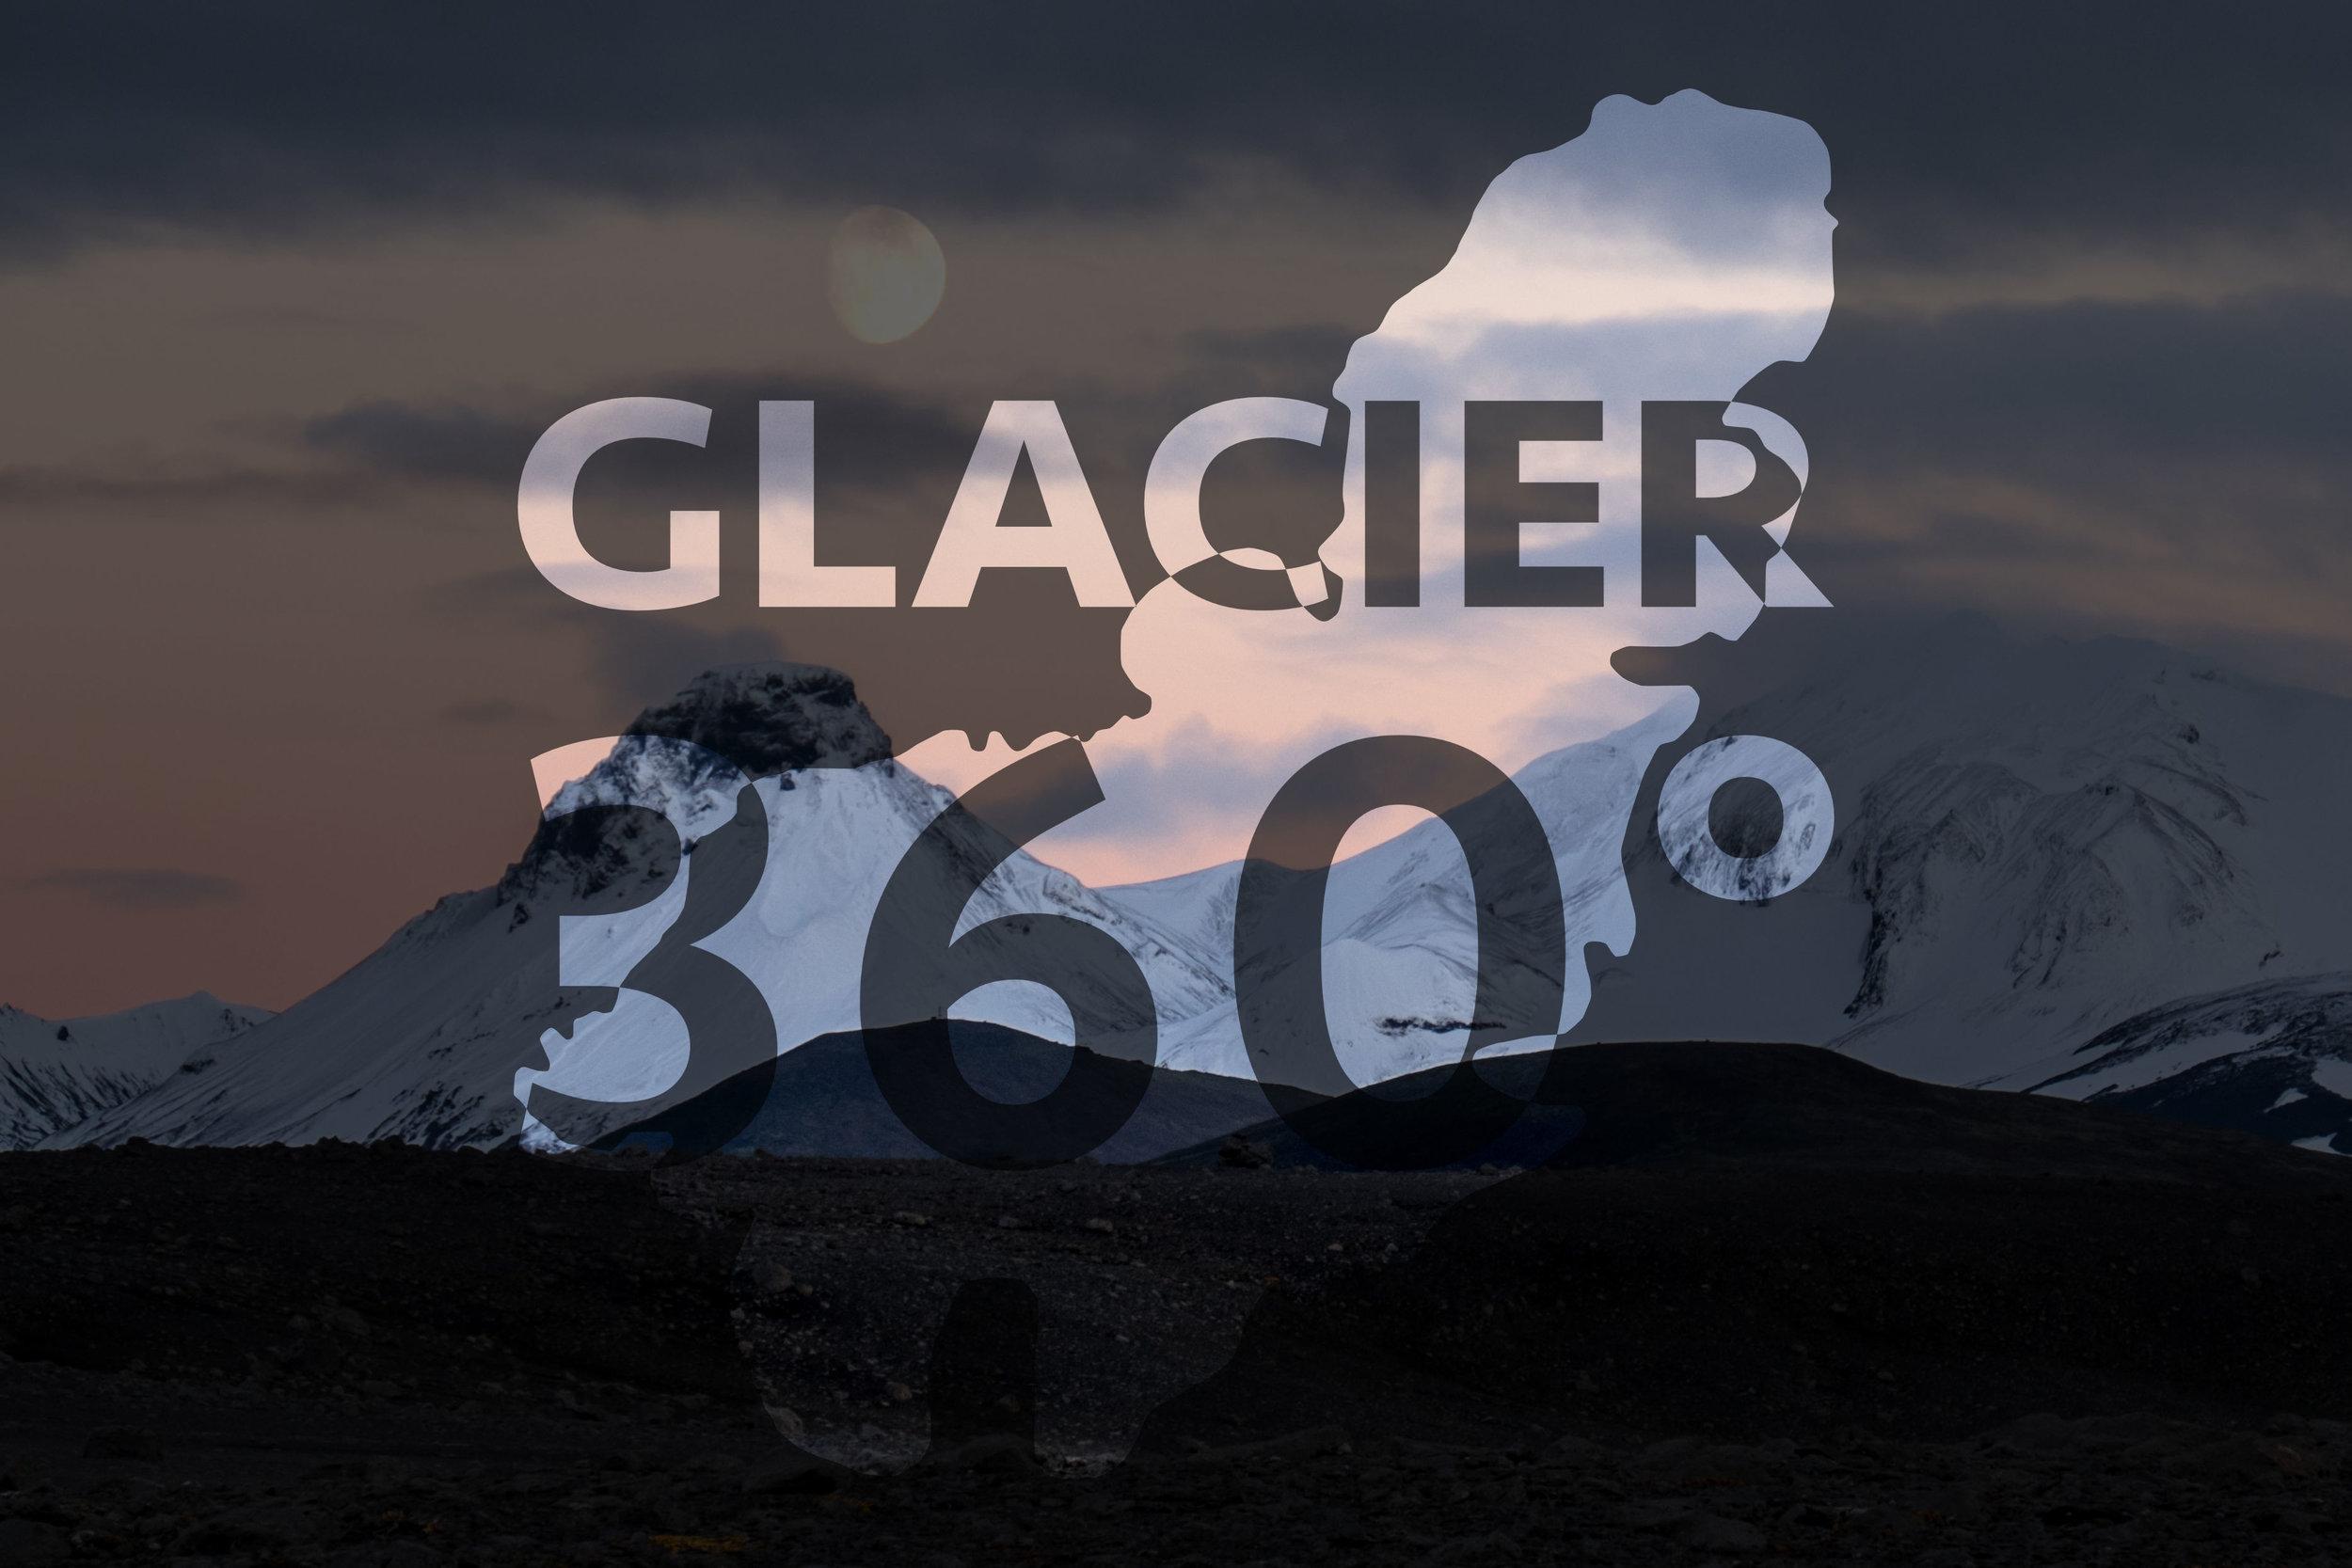 Glacier 360 logo overlay DSCF6974.jpg